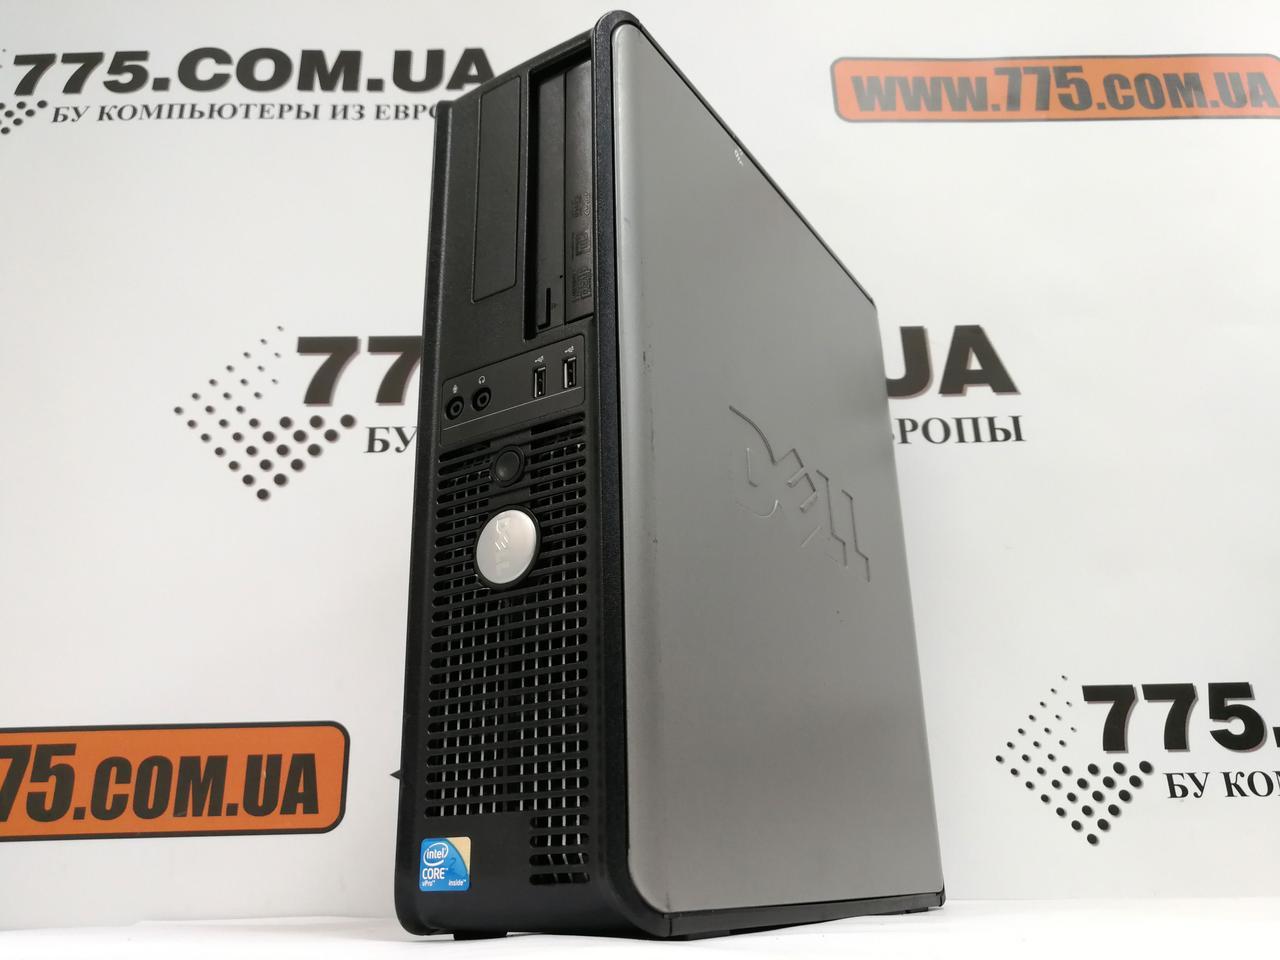 Компьютер Dell OptiPlex 780 (Desktop), Intel Core2Quad 2.4GHz, RAM 8ГБ (DDR3), HDD 500ГБ